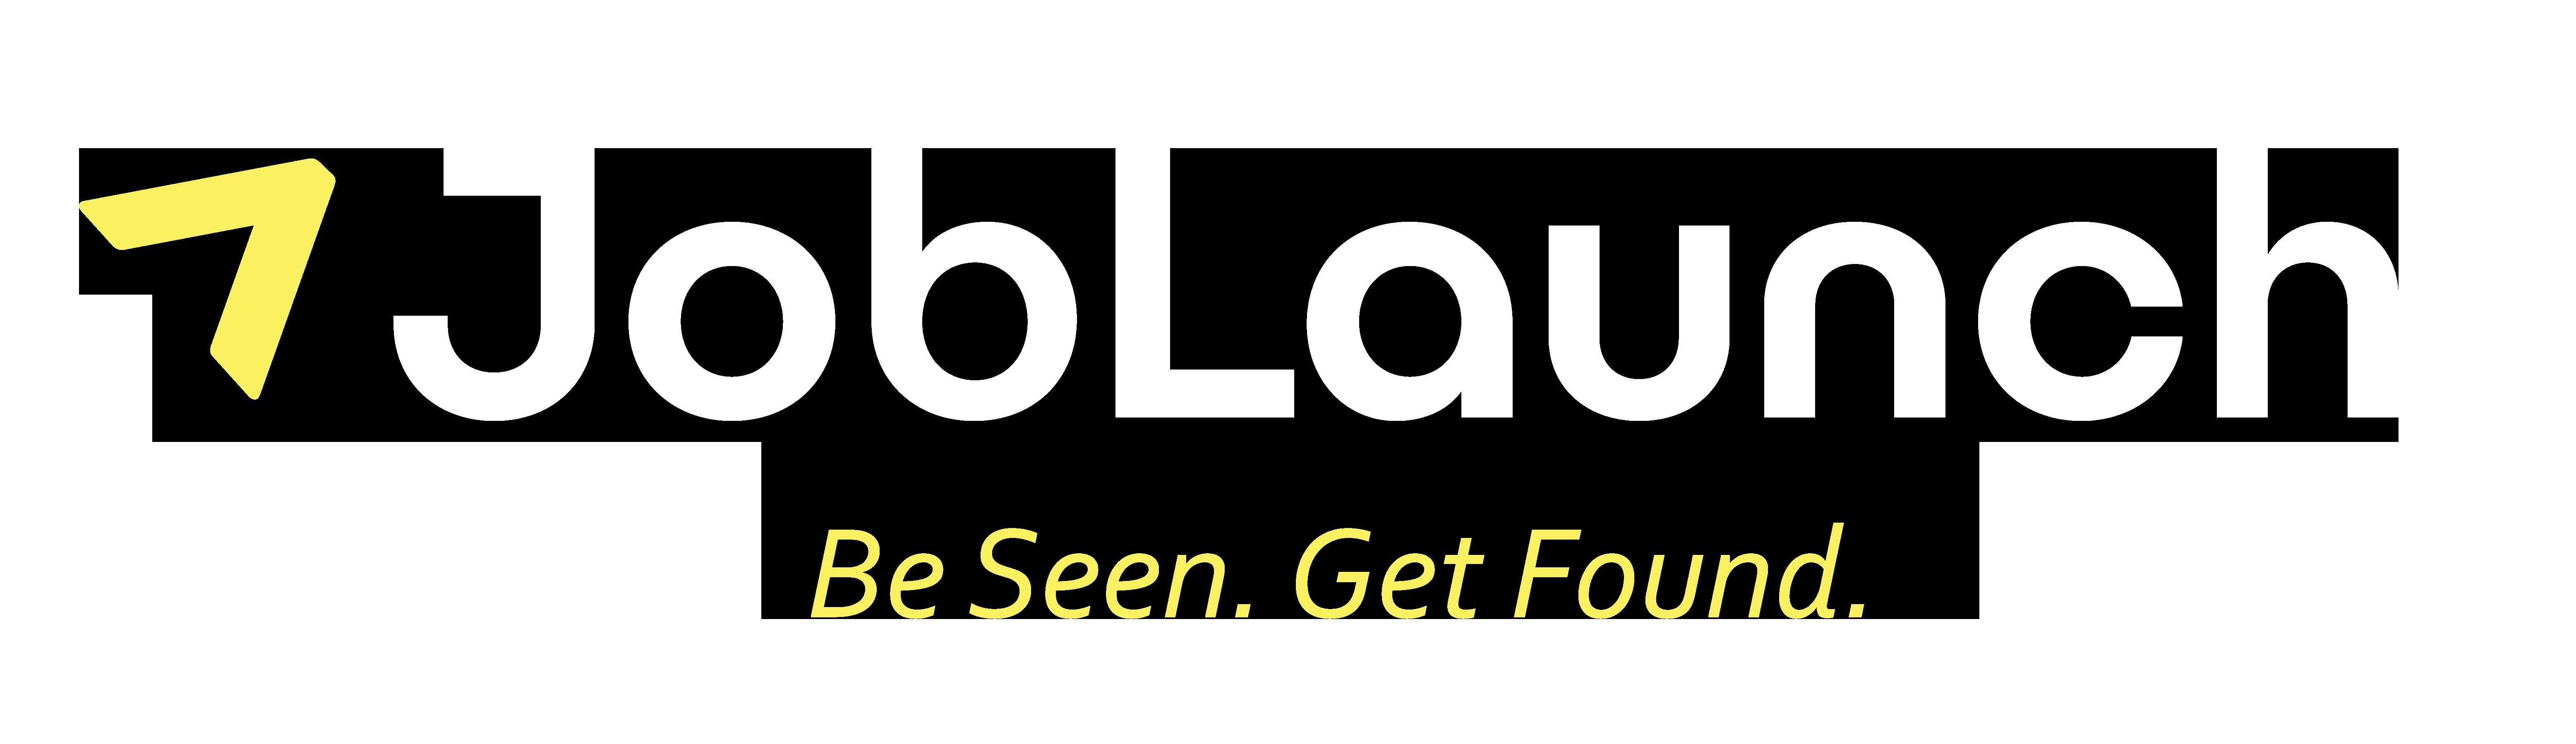 Joblaunch logo whiteandyellow